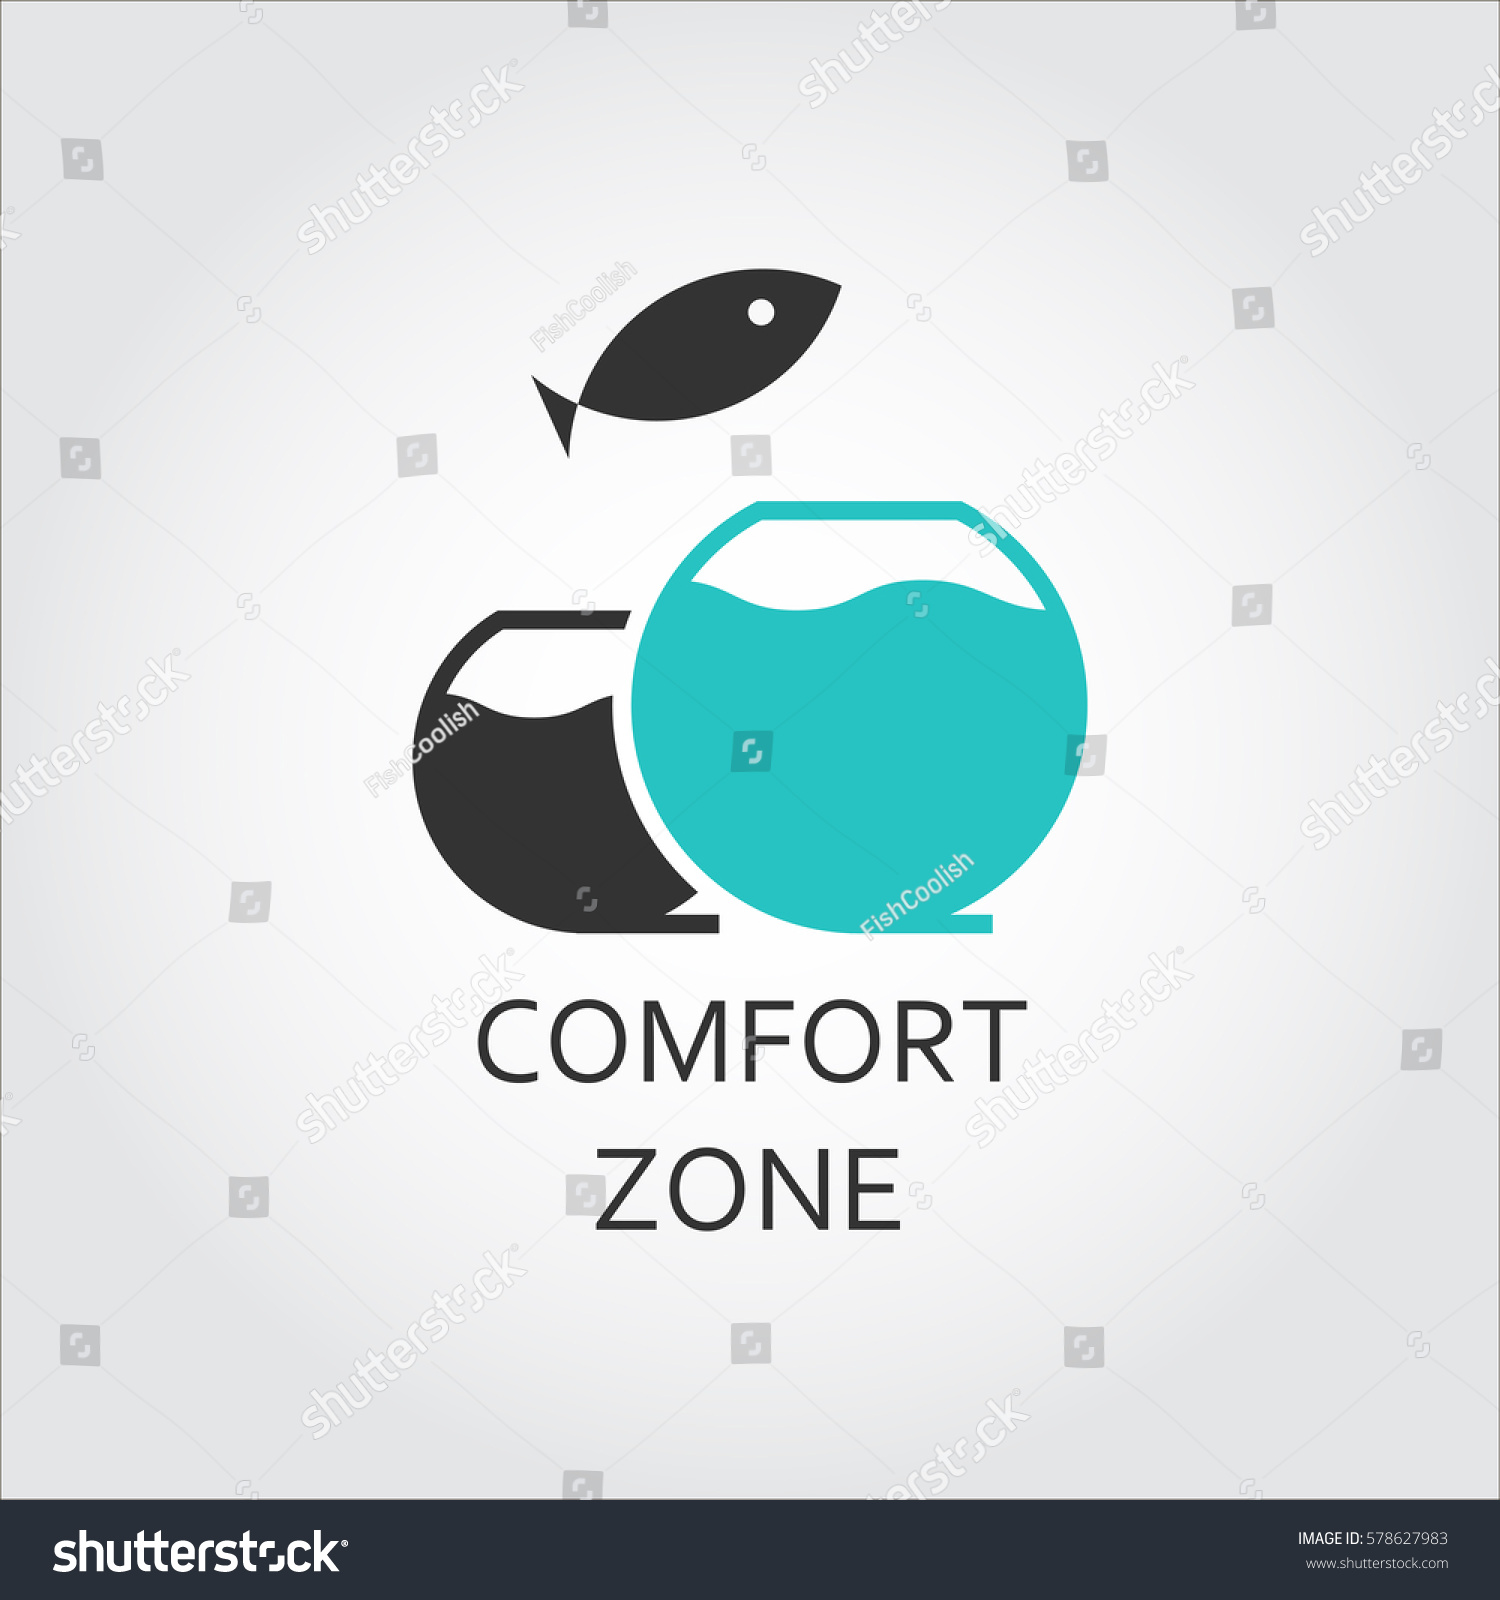 aquarium jumping fish comfort zone concept stock vector 578627983 shutterstock. Black Bedroom Furniture Sets. Home Design Ideas